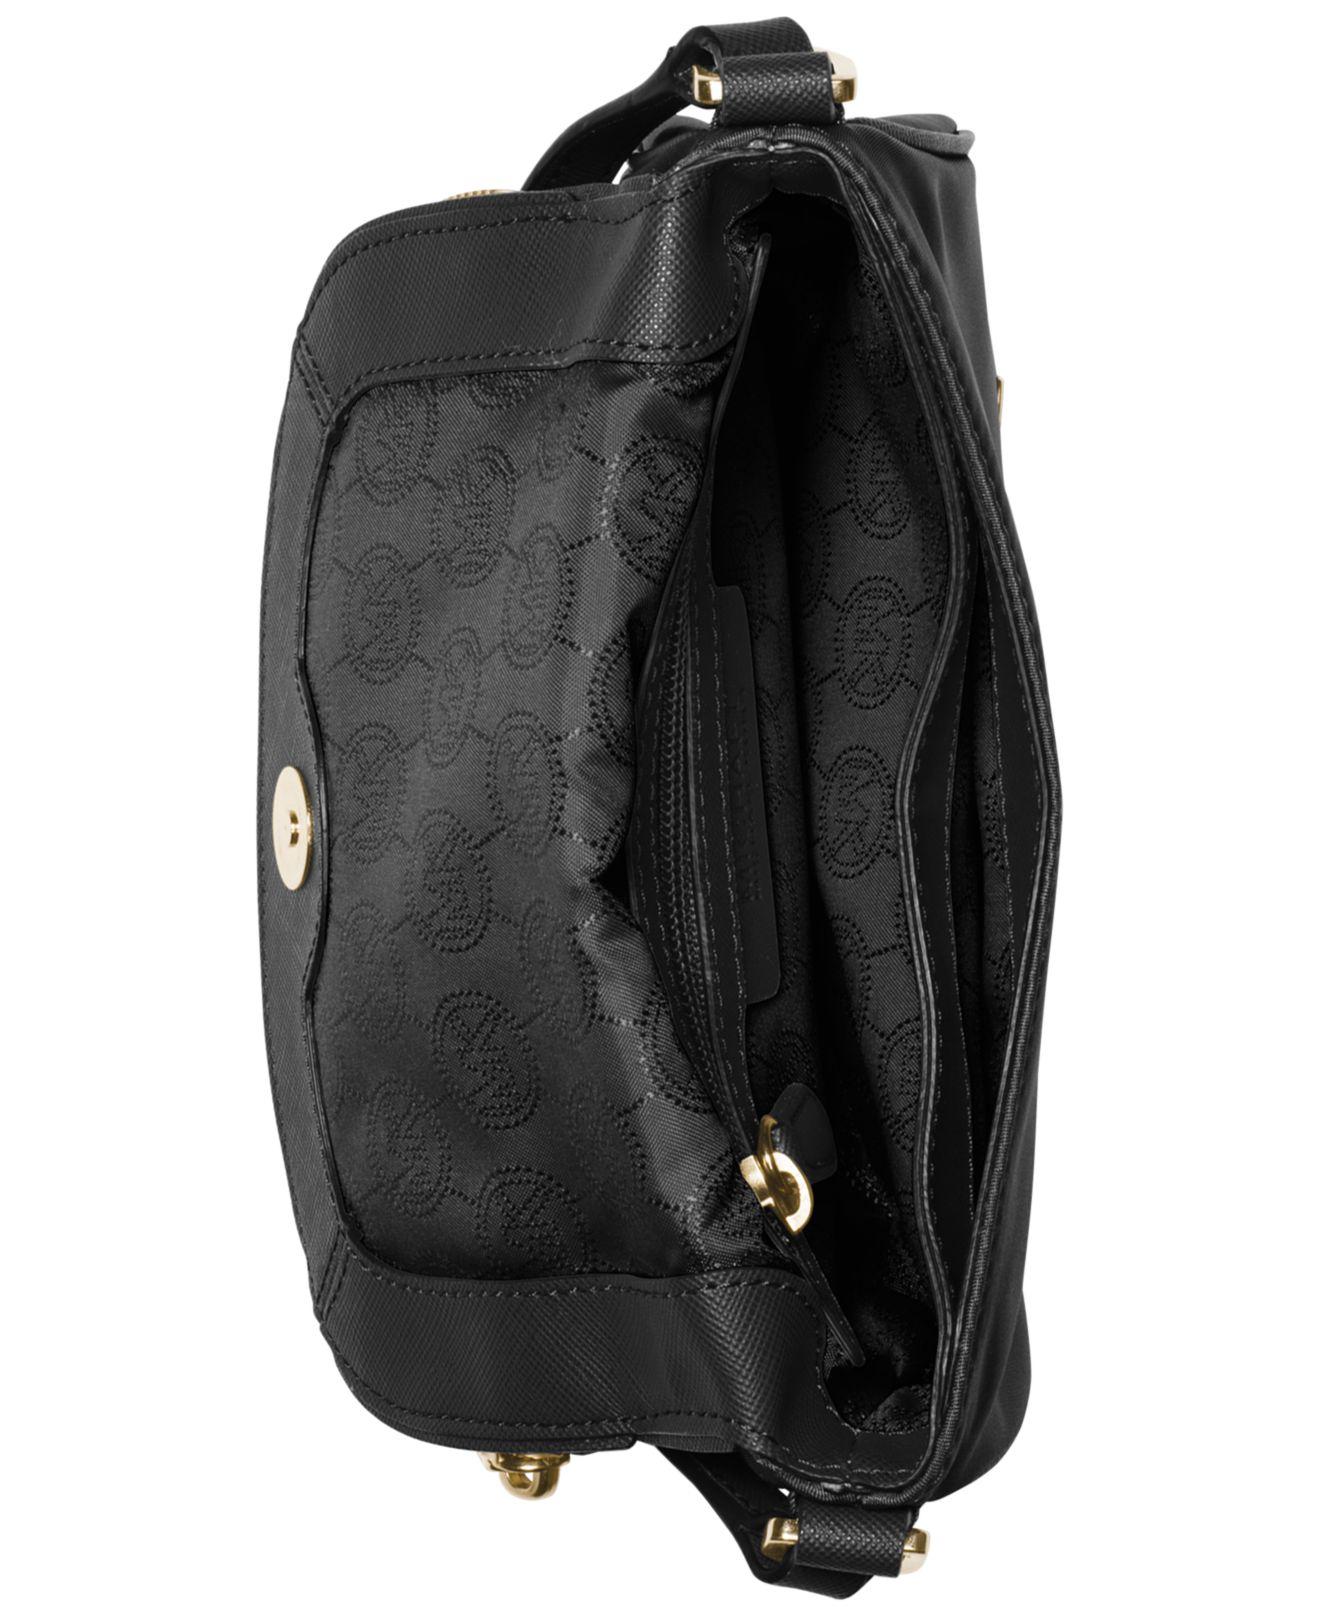 4928208b7c0c Lyst - Michael Kors Michael Bedford Nylon Flap Crossbody in Black